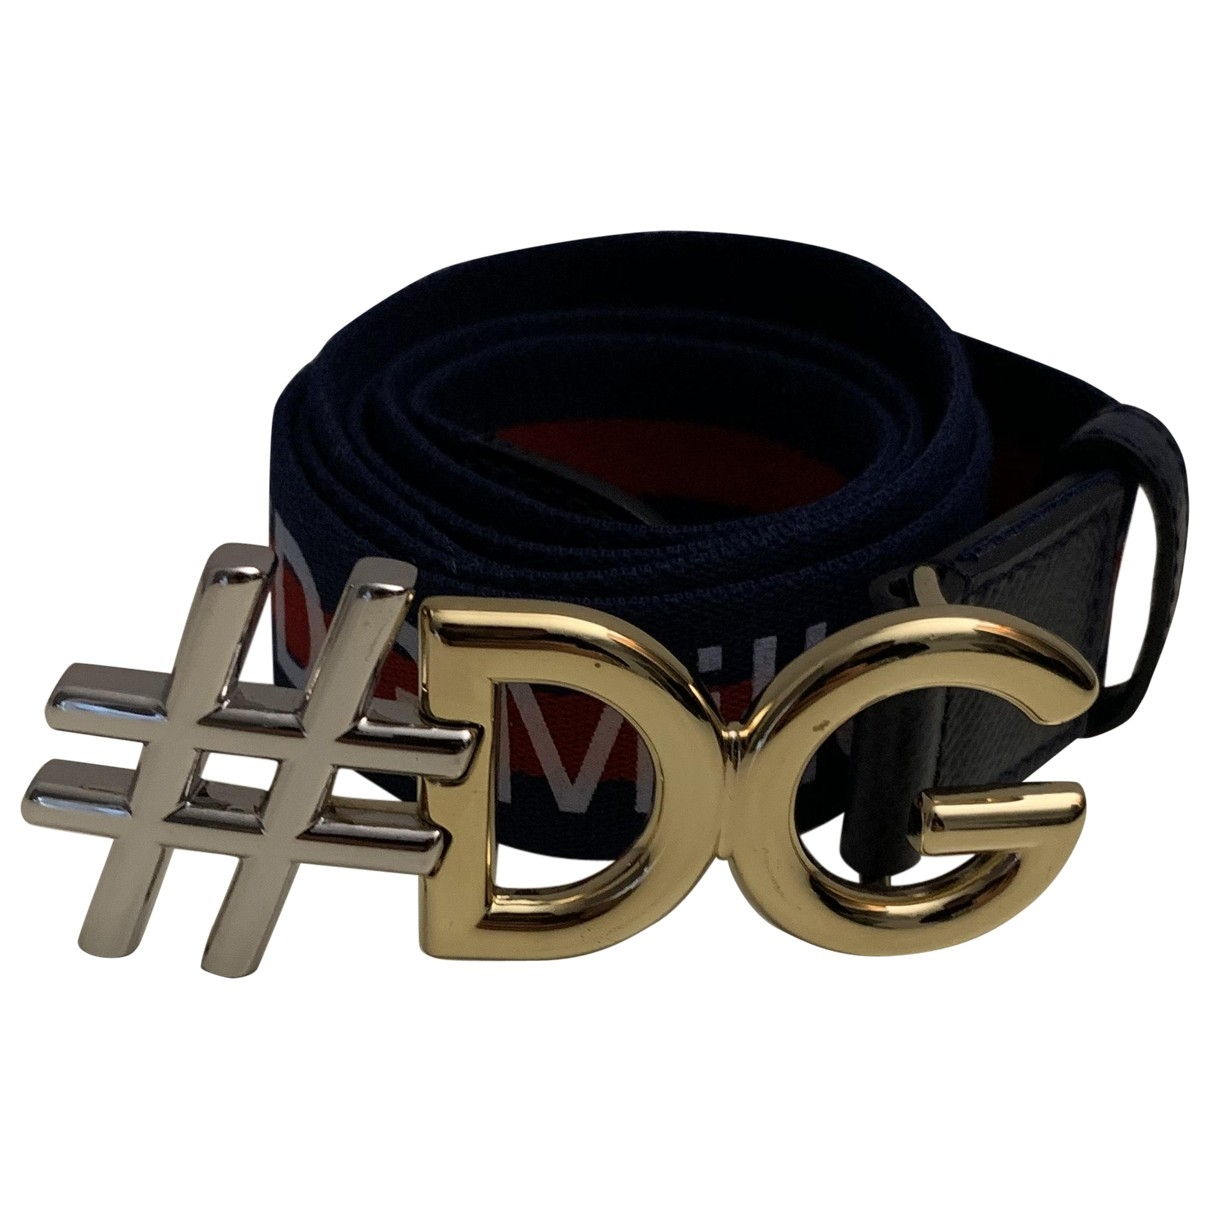 D&g \N Navy Cloth belt for Women 95 cm